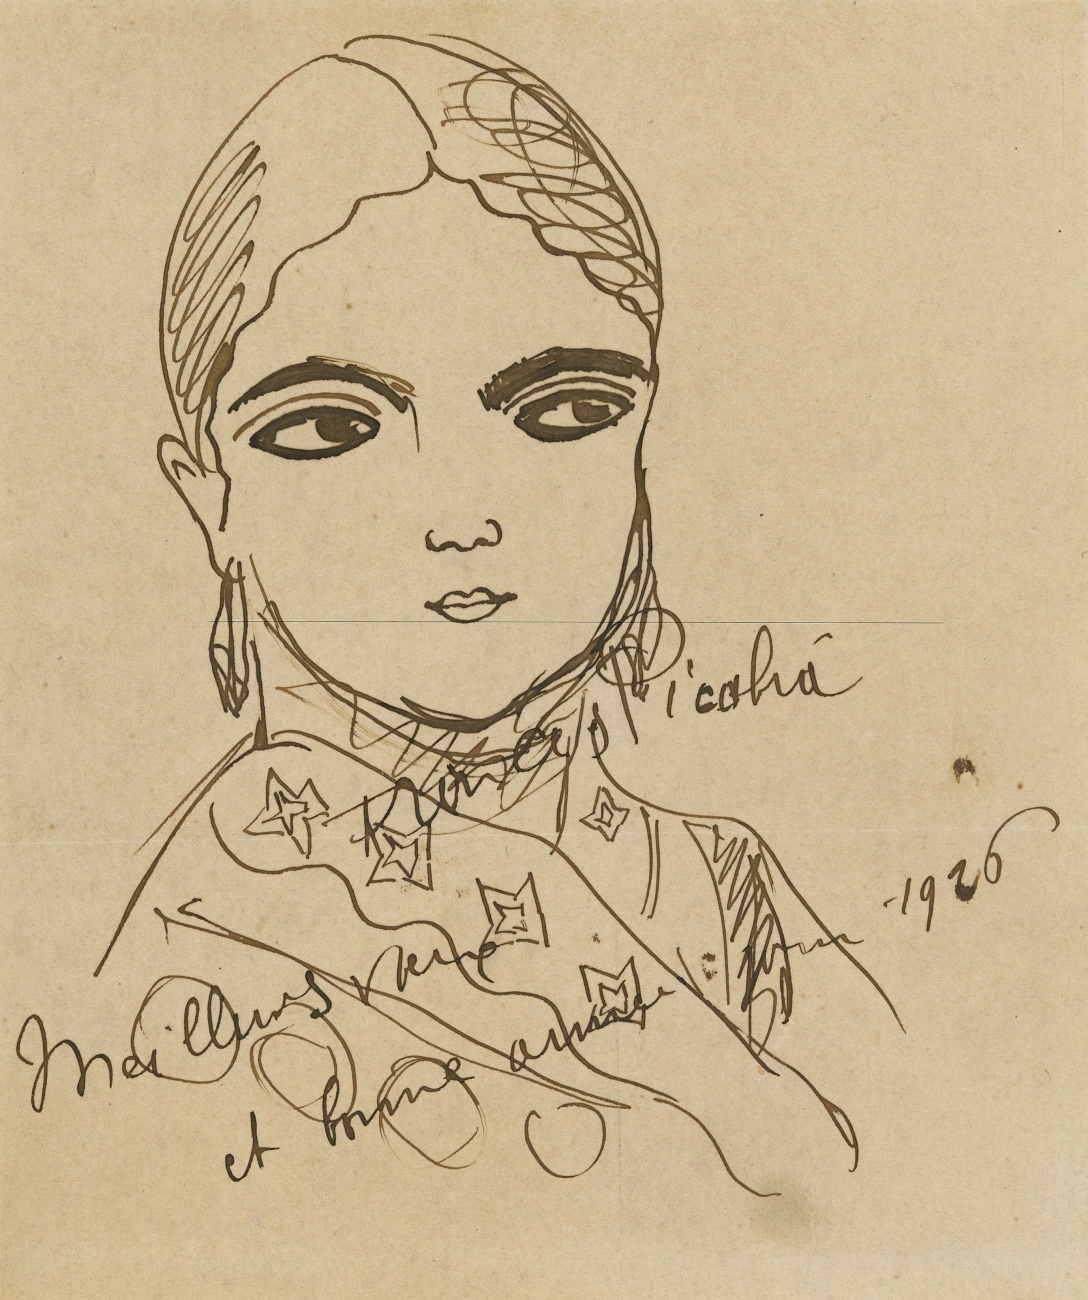 Francis_Picabia_Jeune_fille_1926.jpg